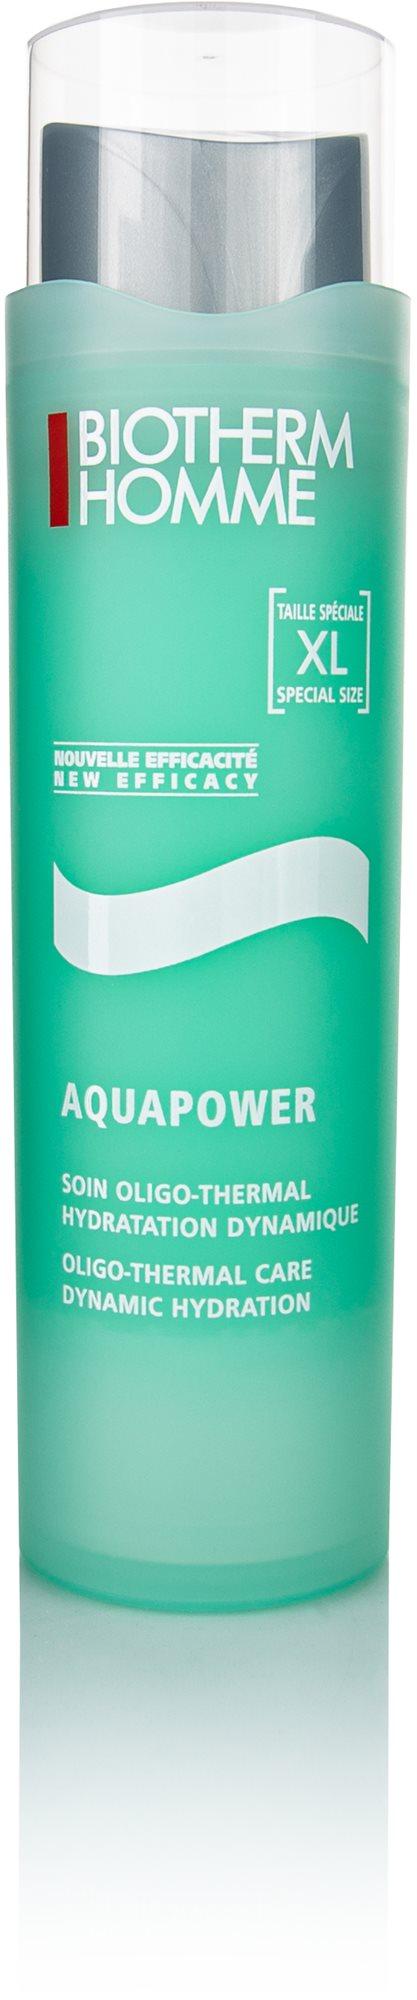 BIOTHERM Homme Aquapower Moisturizer XL Normal to Combine Skin 100 ml